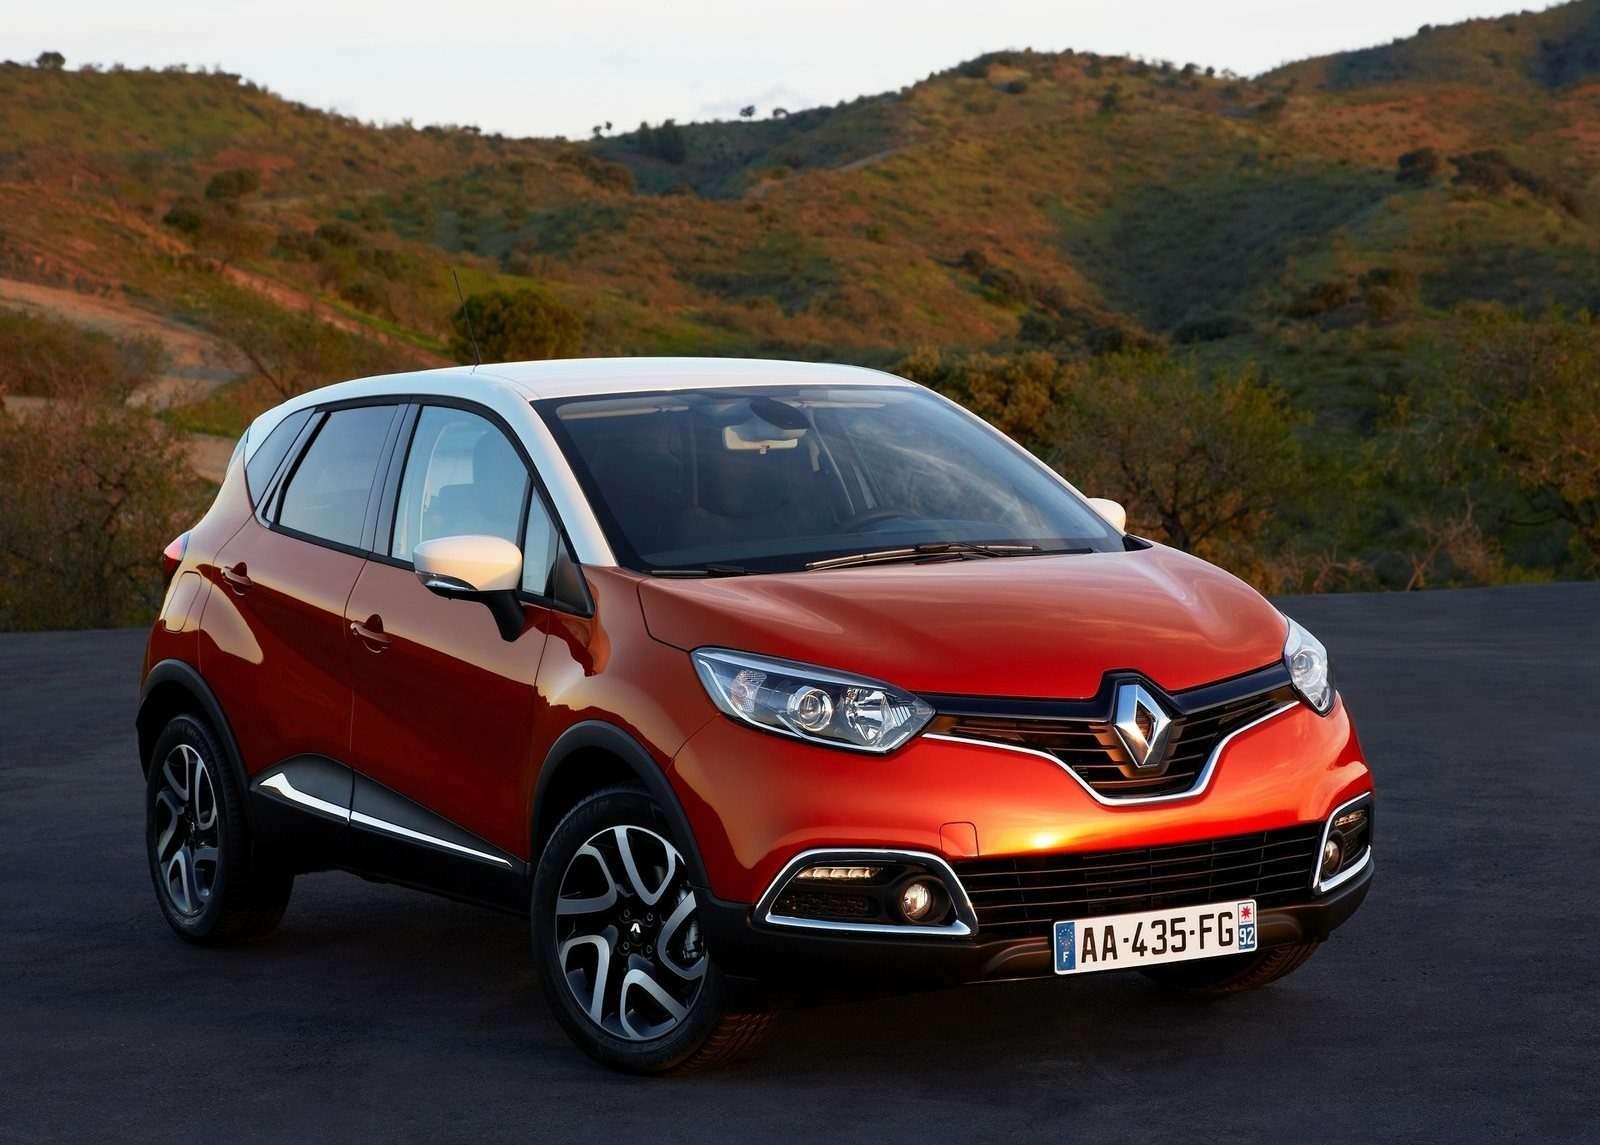 Renault Сaptur